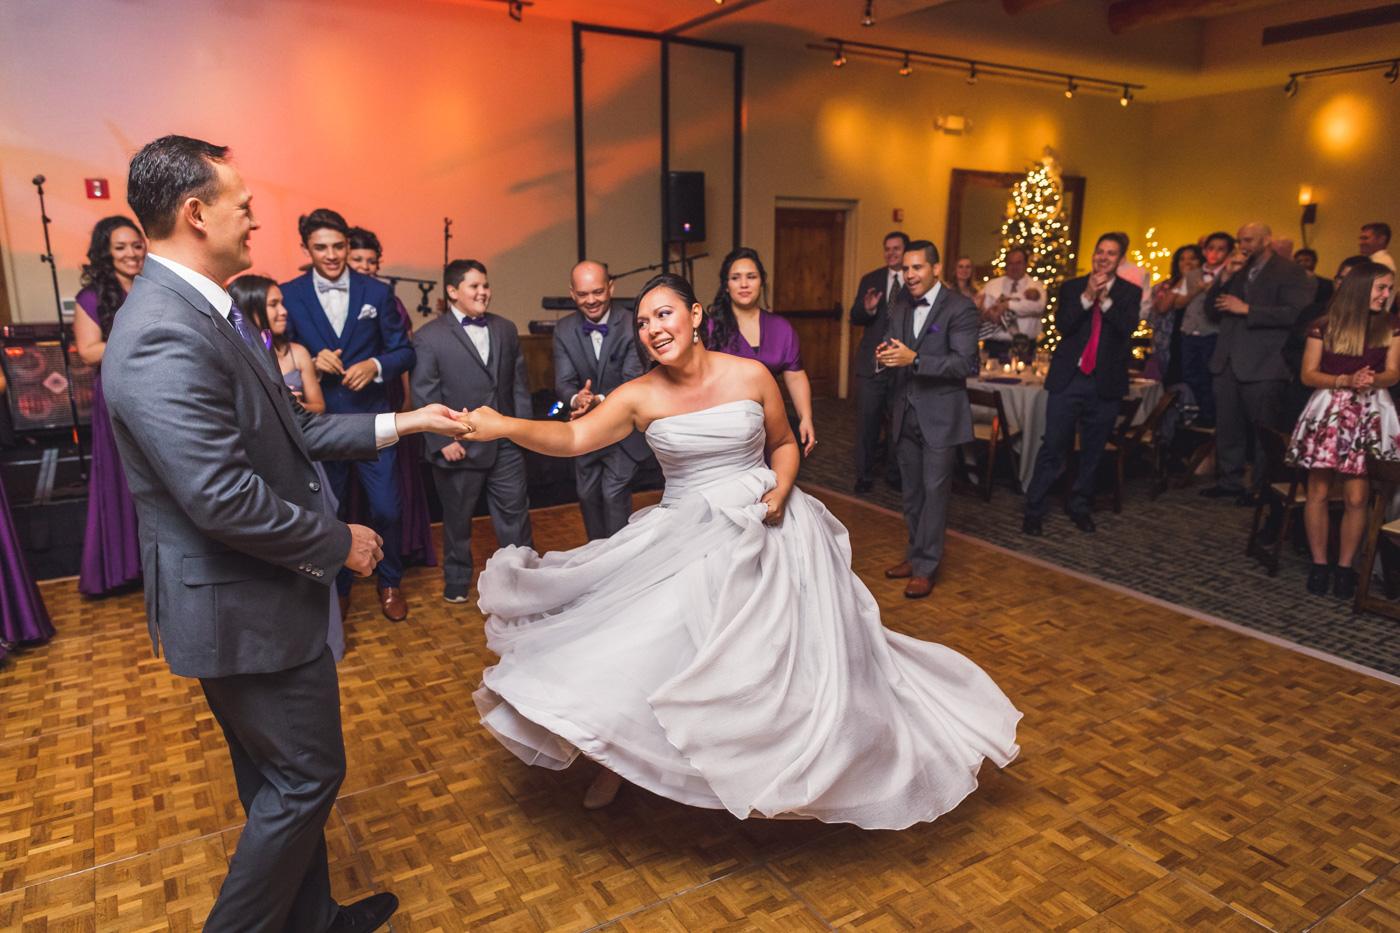 bride-and-groom-dancing